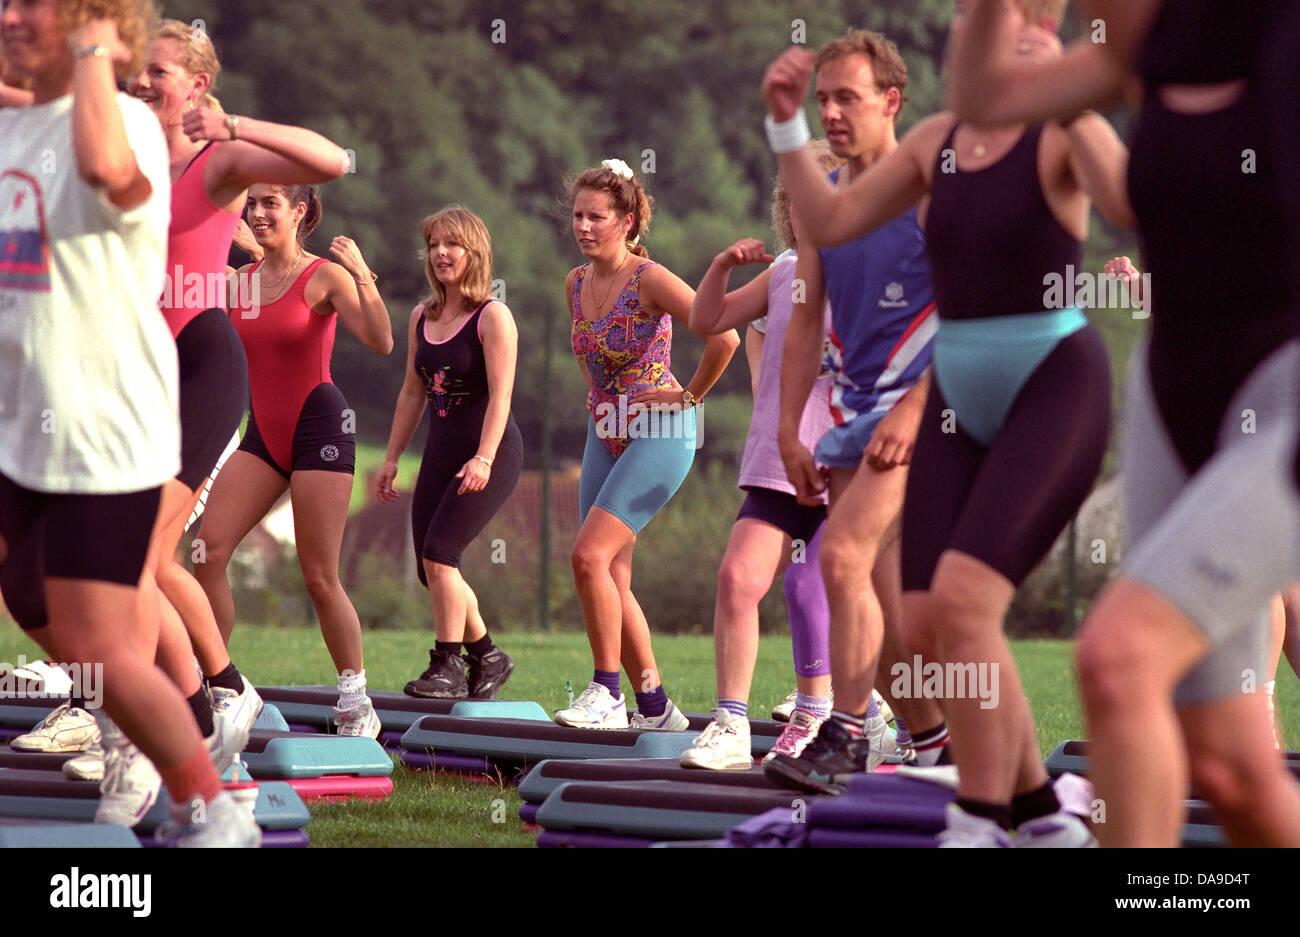 90's Aerobic Athletes